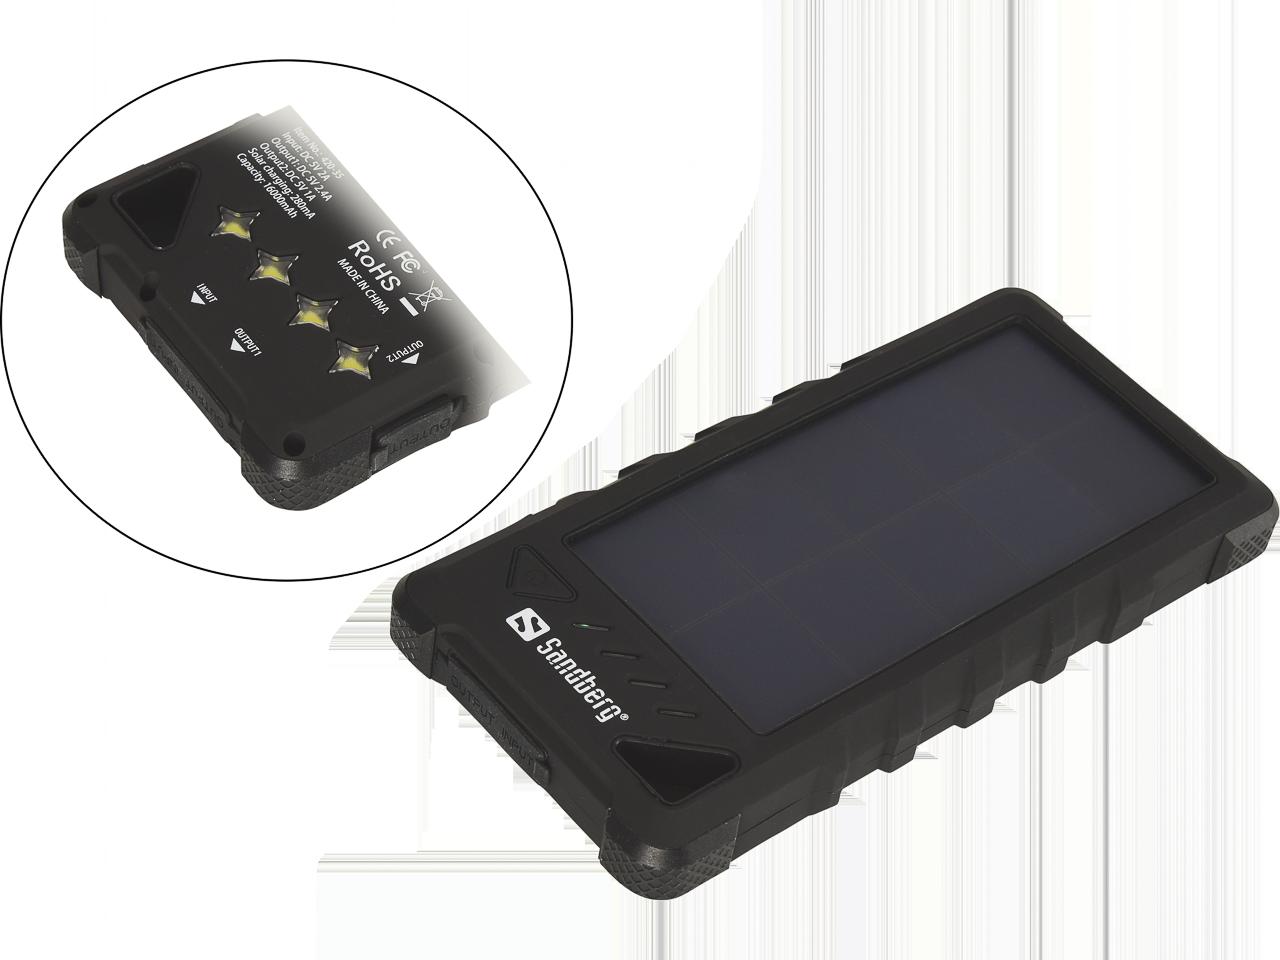 SANDBERG USB POWERBANK 16.000 OUTDOOR 420-35 16.000mAh/solar/waterproof/Li-ion 1